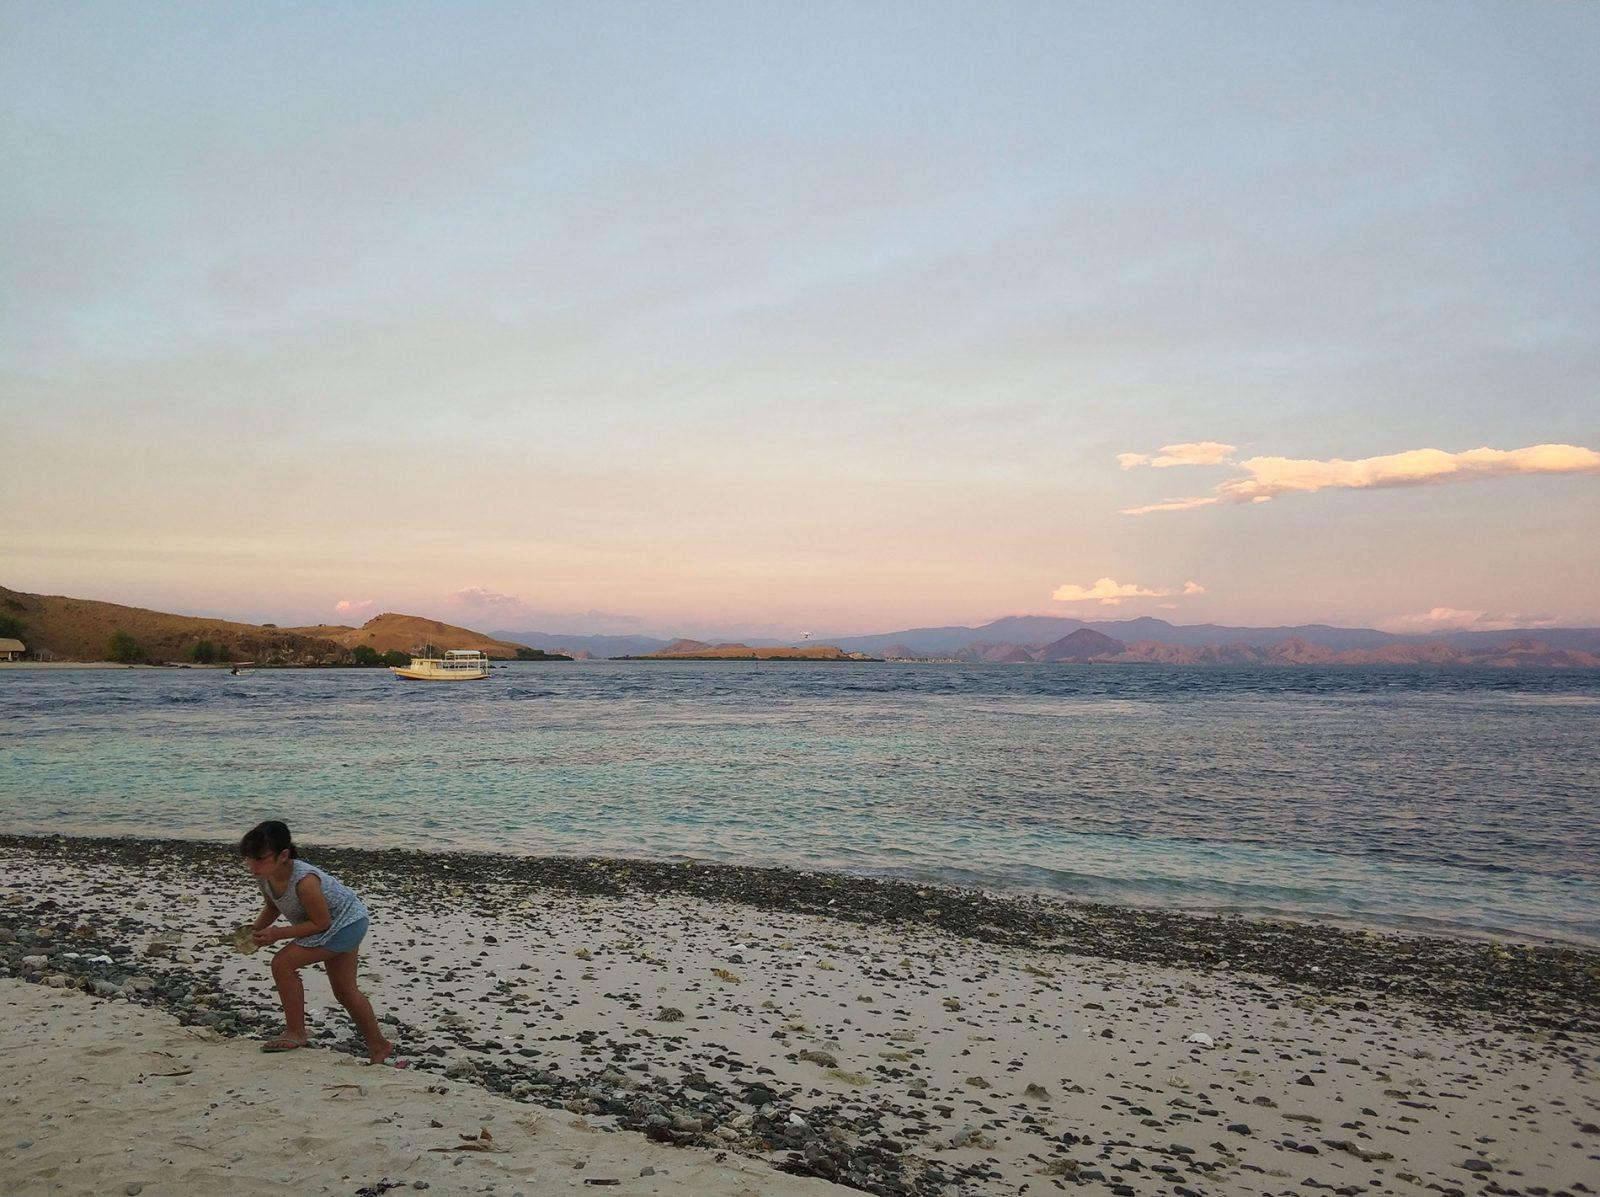 camping-site-beach